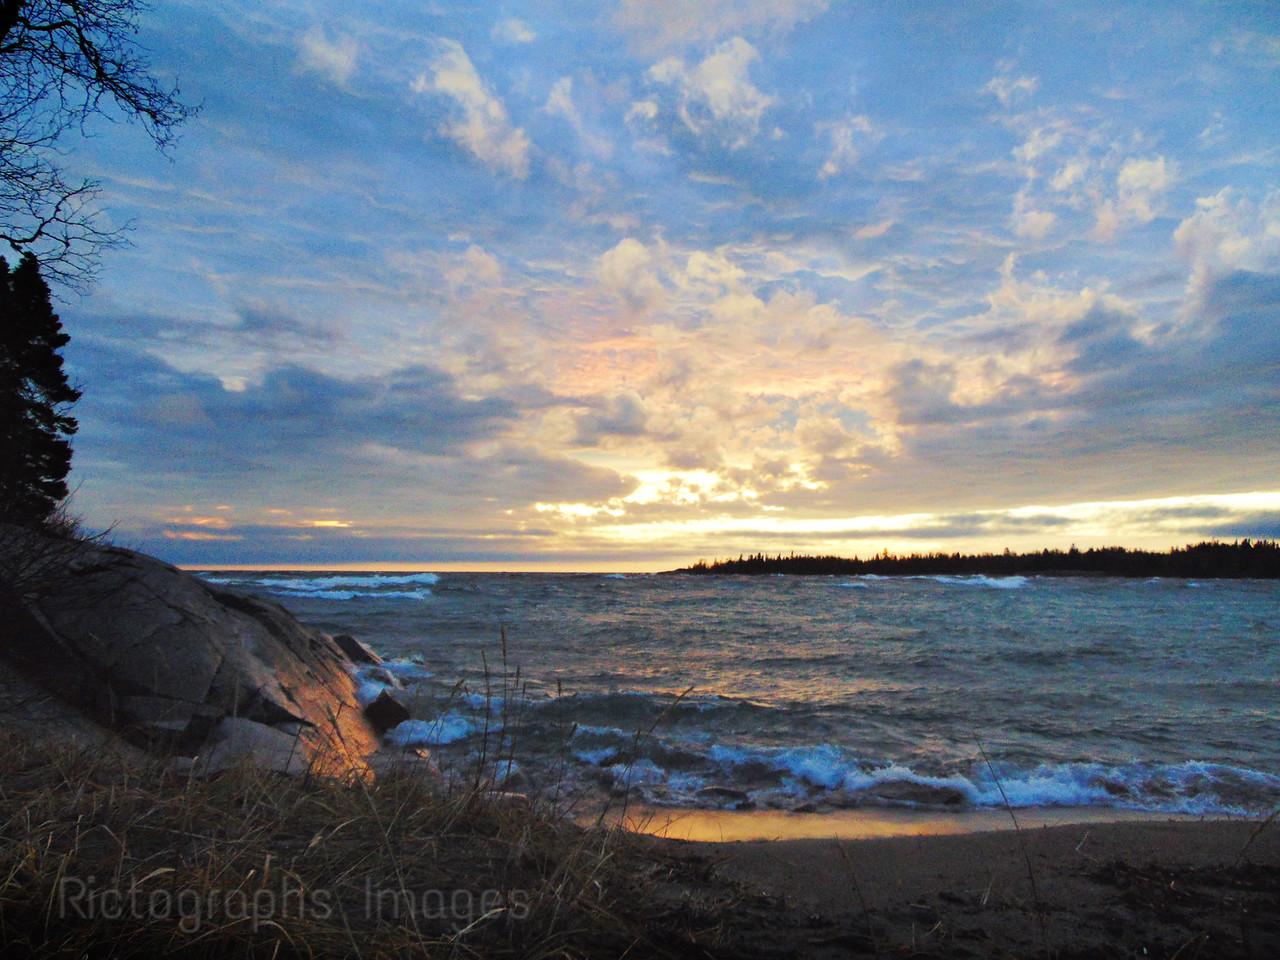 A Lake Superior Landscape Photo, Rictographs Images